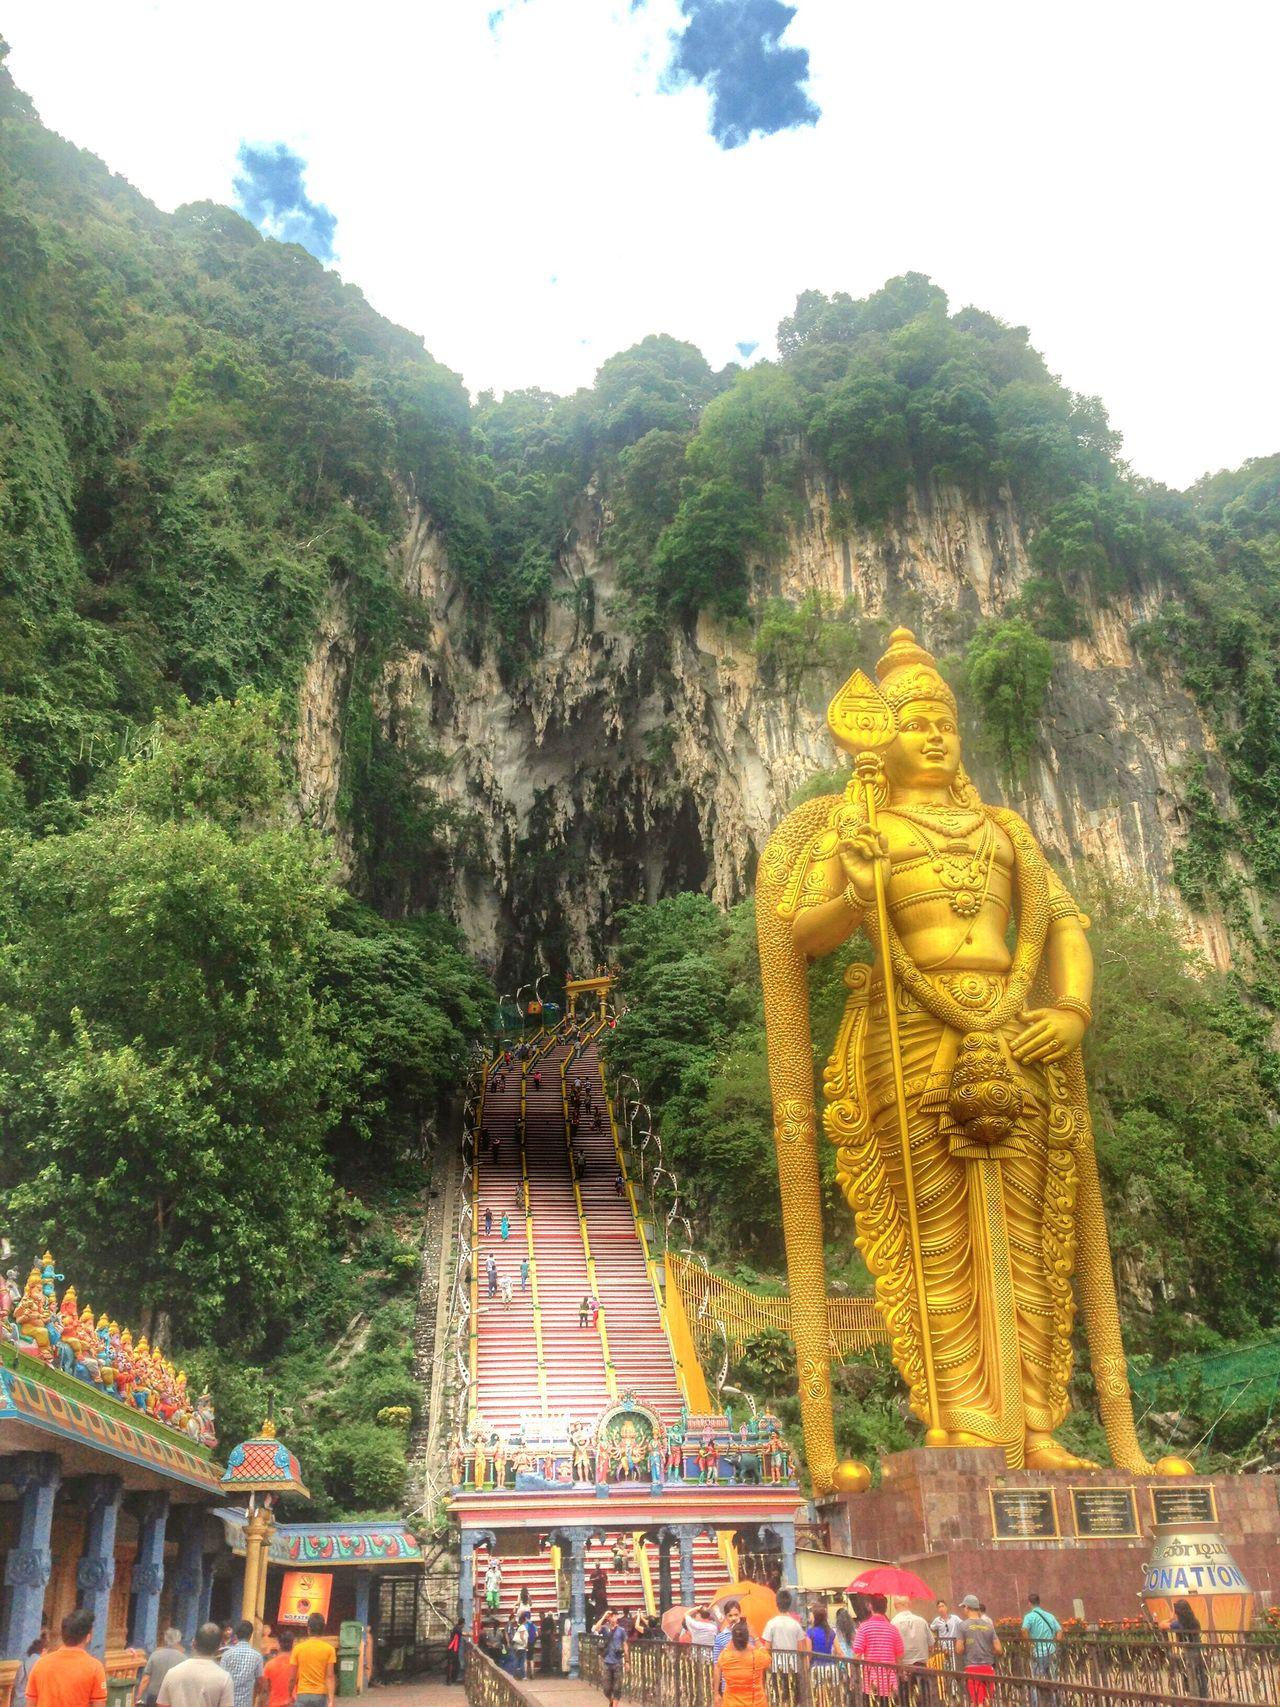 Entrance to Batu Caves with Murugan statue. Gombak, Selangor, Malaysia. Malaysia Truly Asia Malaysia Scenery Batucave BatuCavesHinduTemple Batu Caves Batu Caves -Malaysia